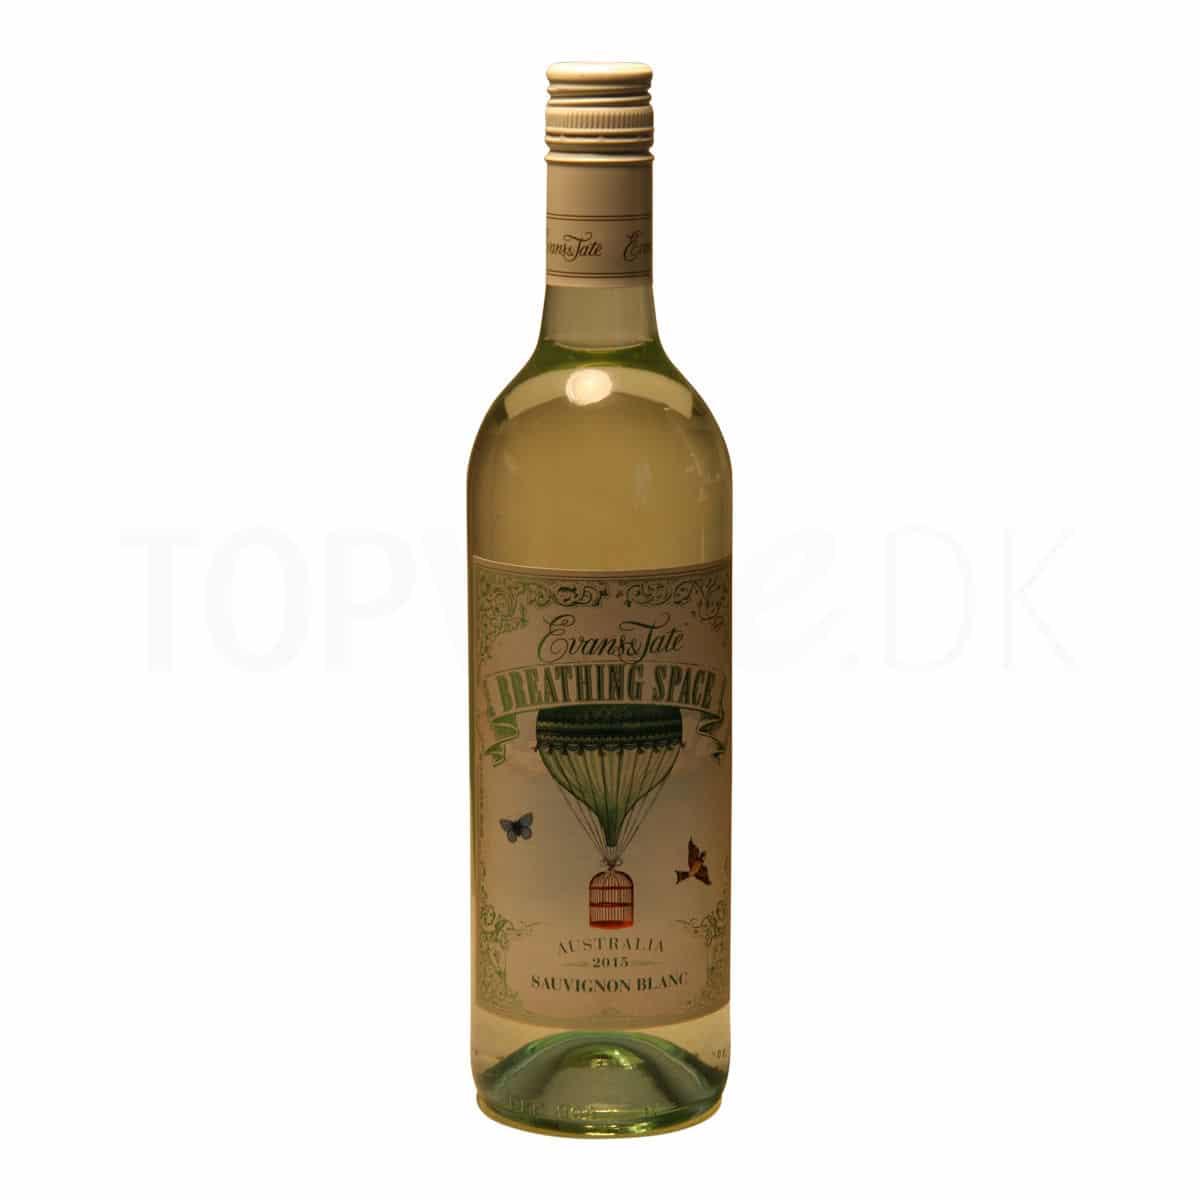 Topvine Evans Tate Breathing Space Sauvignon Blanc 2015